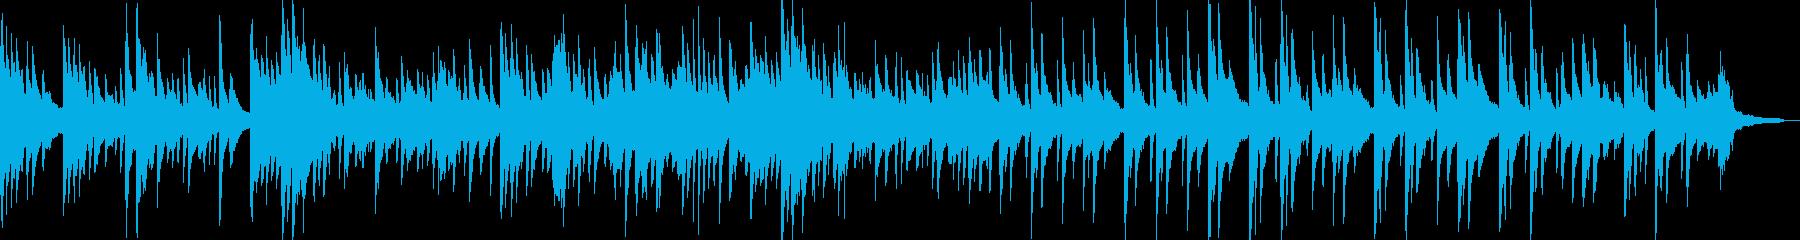 TV企業VP映像にピアノソロ大人の雰囲気の再生済みの波形